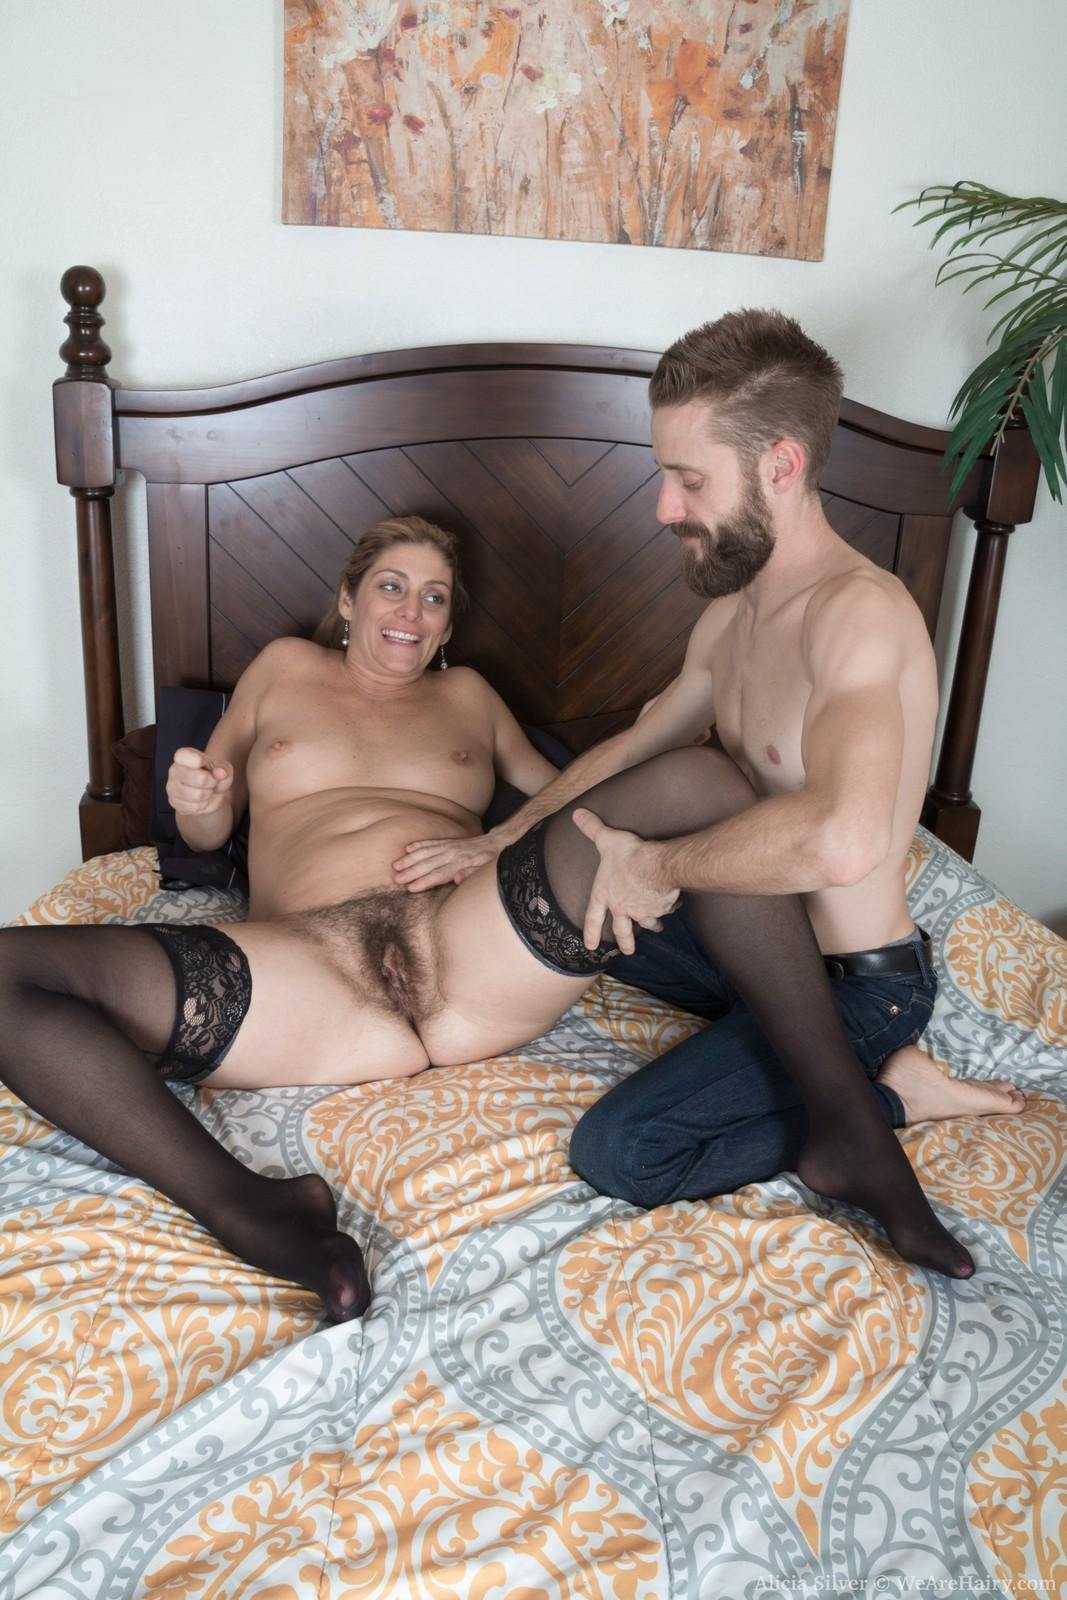 alicia-silver-has-hot-sex-in-her-bedroom4.jpg